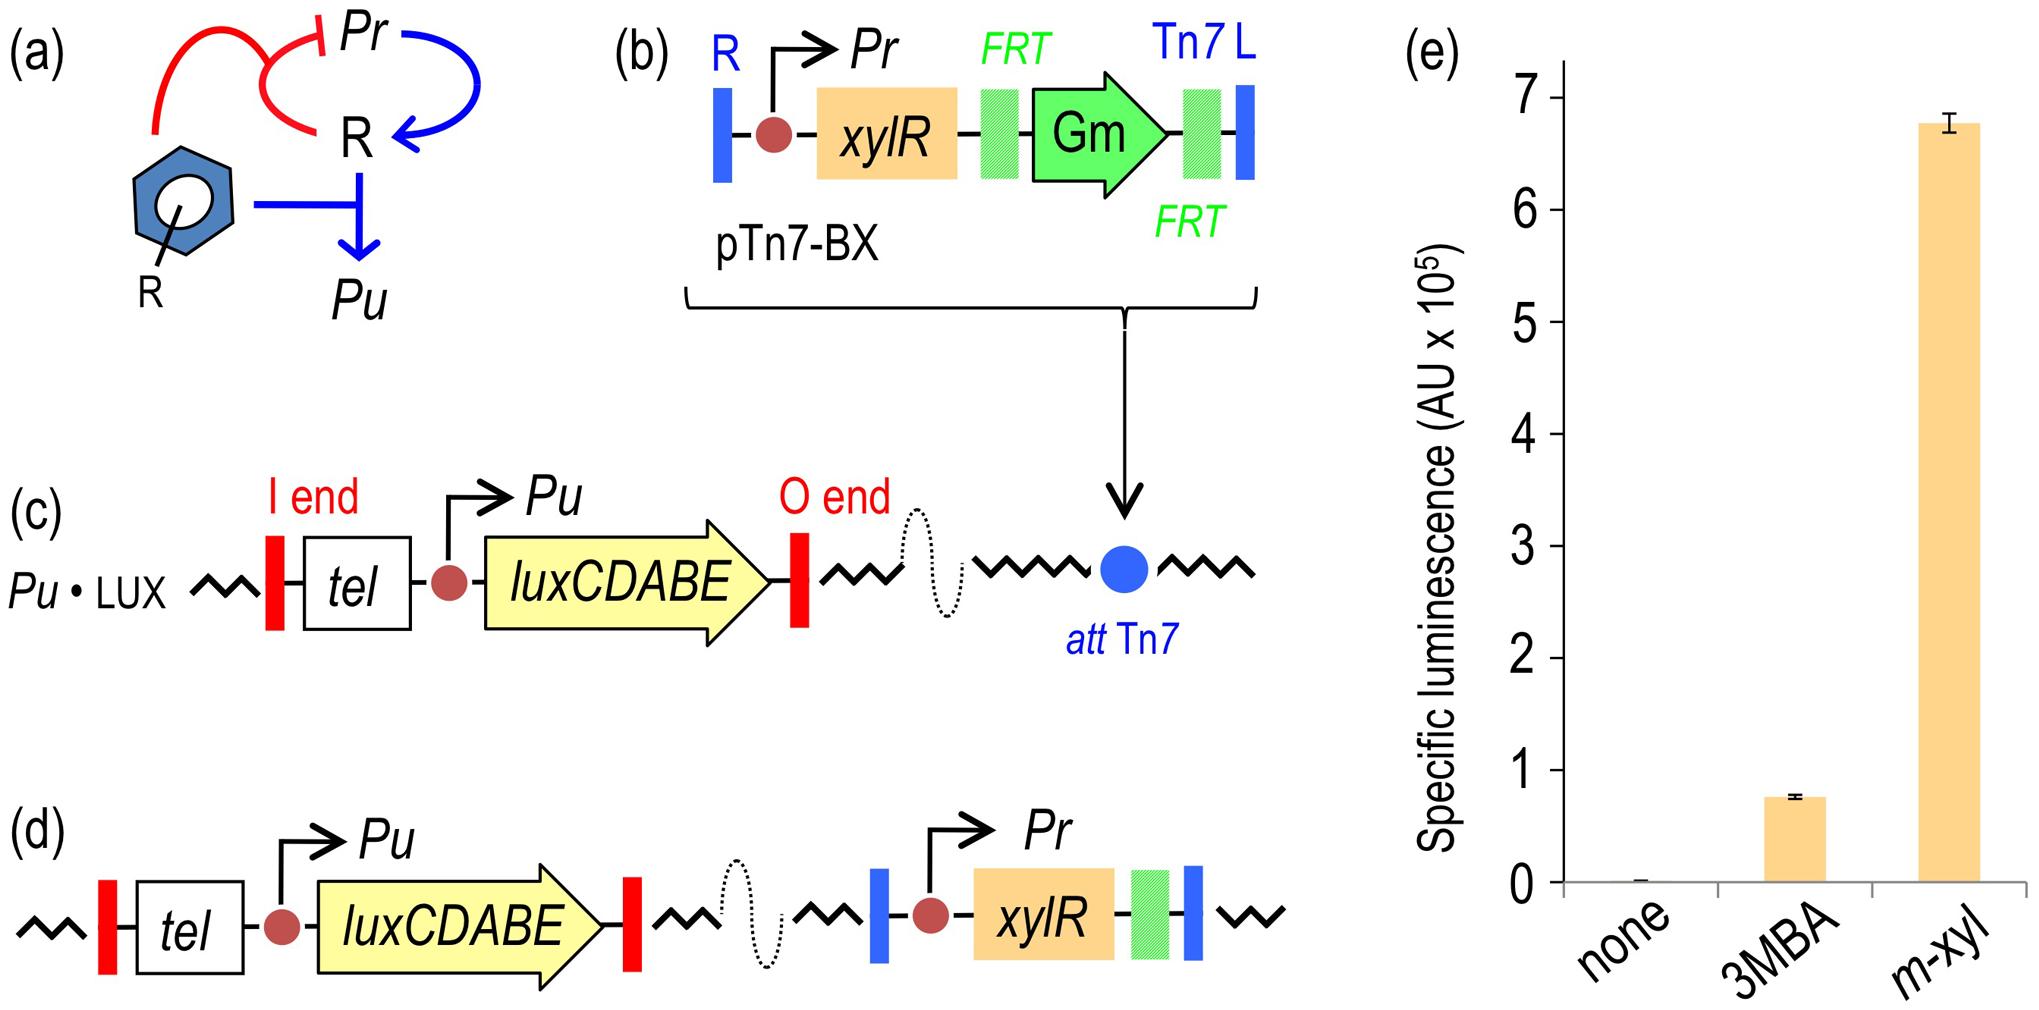 Performance of the XylR/<i>Pu</i> regulatory node in response to optimal (<i>m</i>-xylene) and suboptimal (3-methylbenzyl alcohol, 3MBA) inducers.